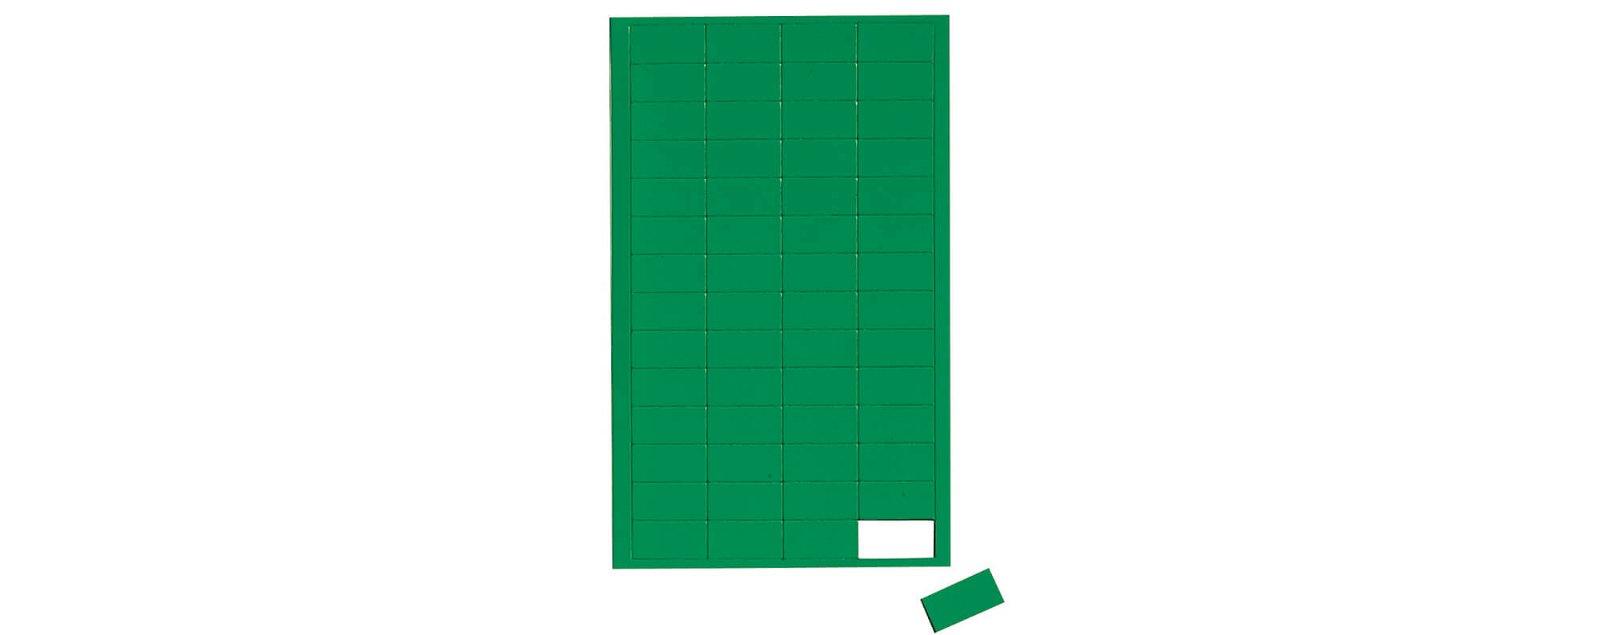 Magnetsymbole Rechteck,  56 St./Btl., grün